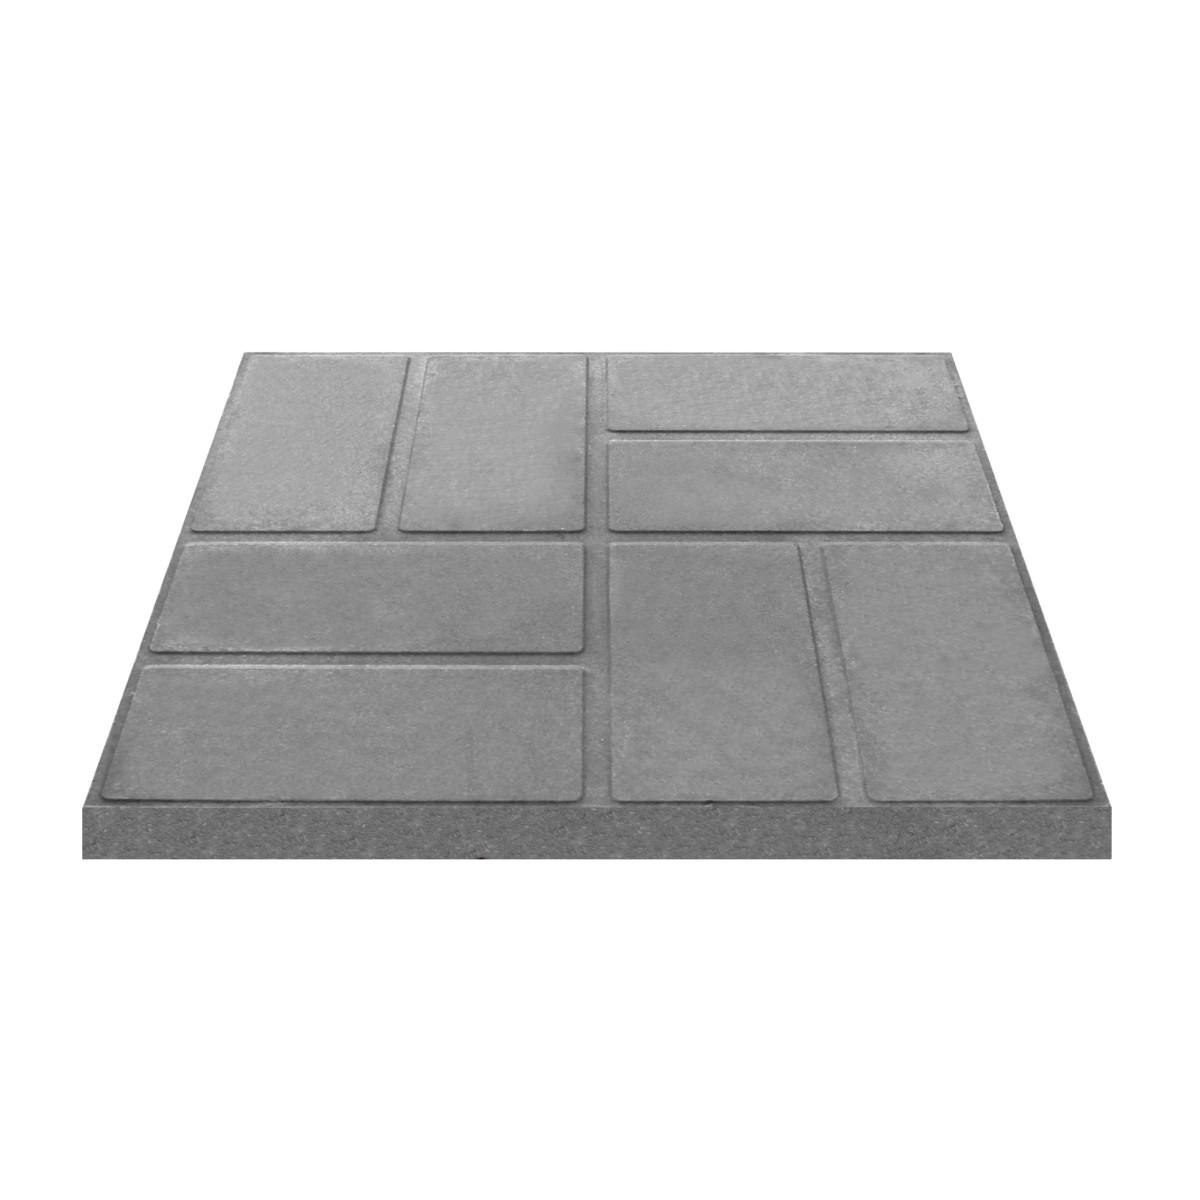 Плитка тротуарная 330x330x35 мм цвет серый